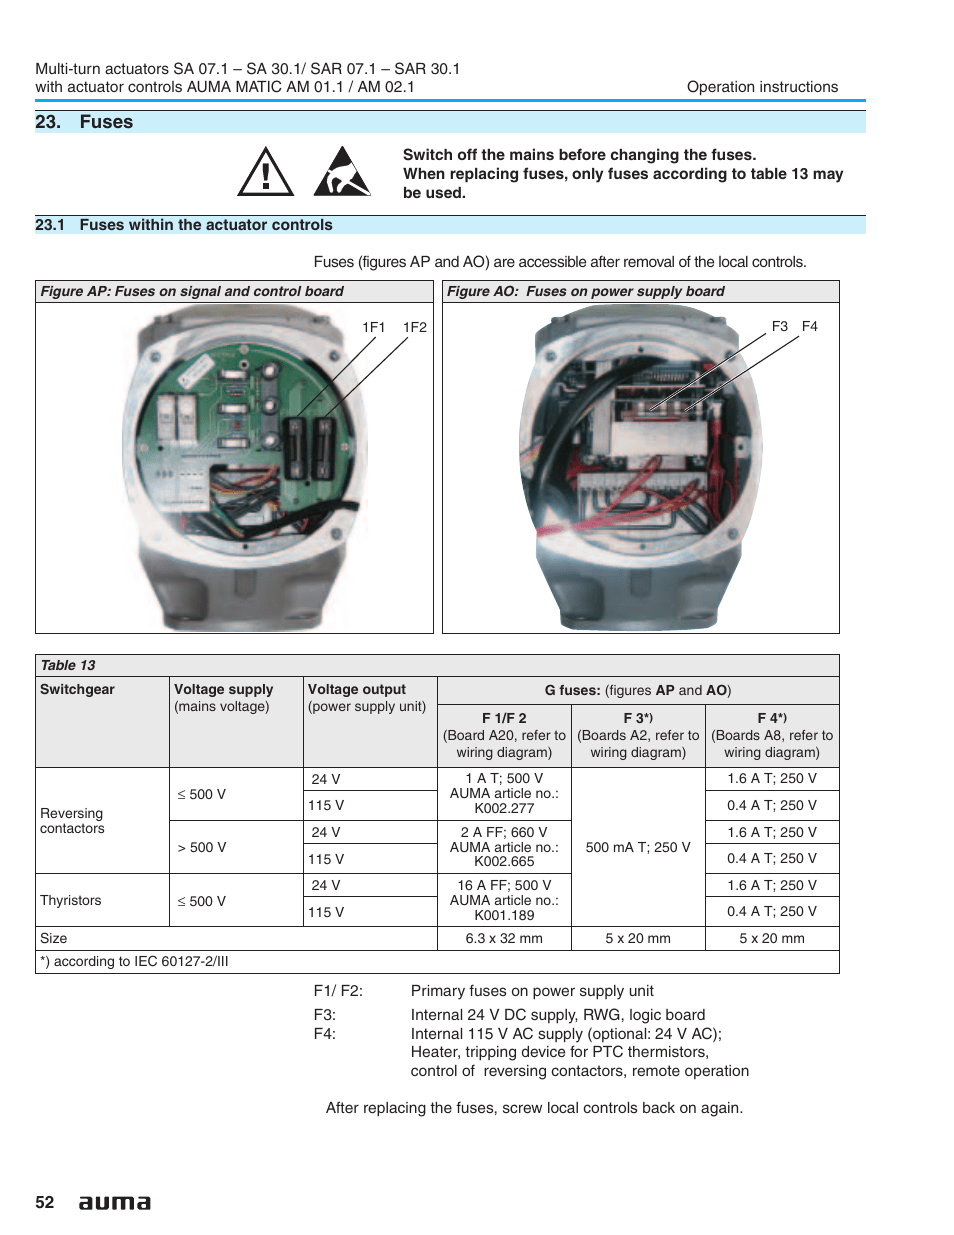 auma electric multi turn actuators sa 071 161_sar 071 161 matic am 011 021 page52?resize=665%2C861 wiring auma diagram sa07 2 2005 chevrolet hd diesel engine bettis actuator wiring diagrams at gsmportal.co